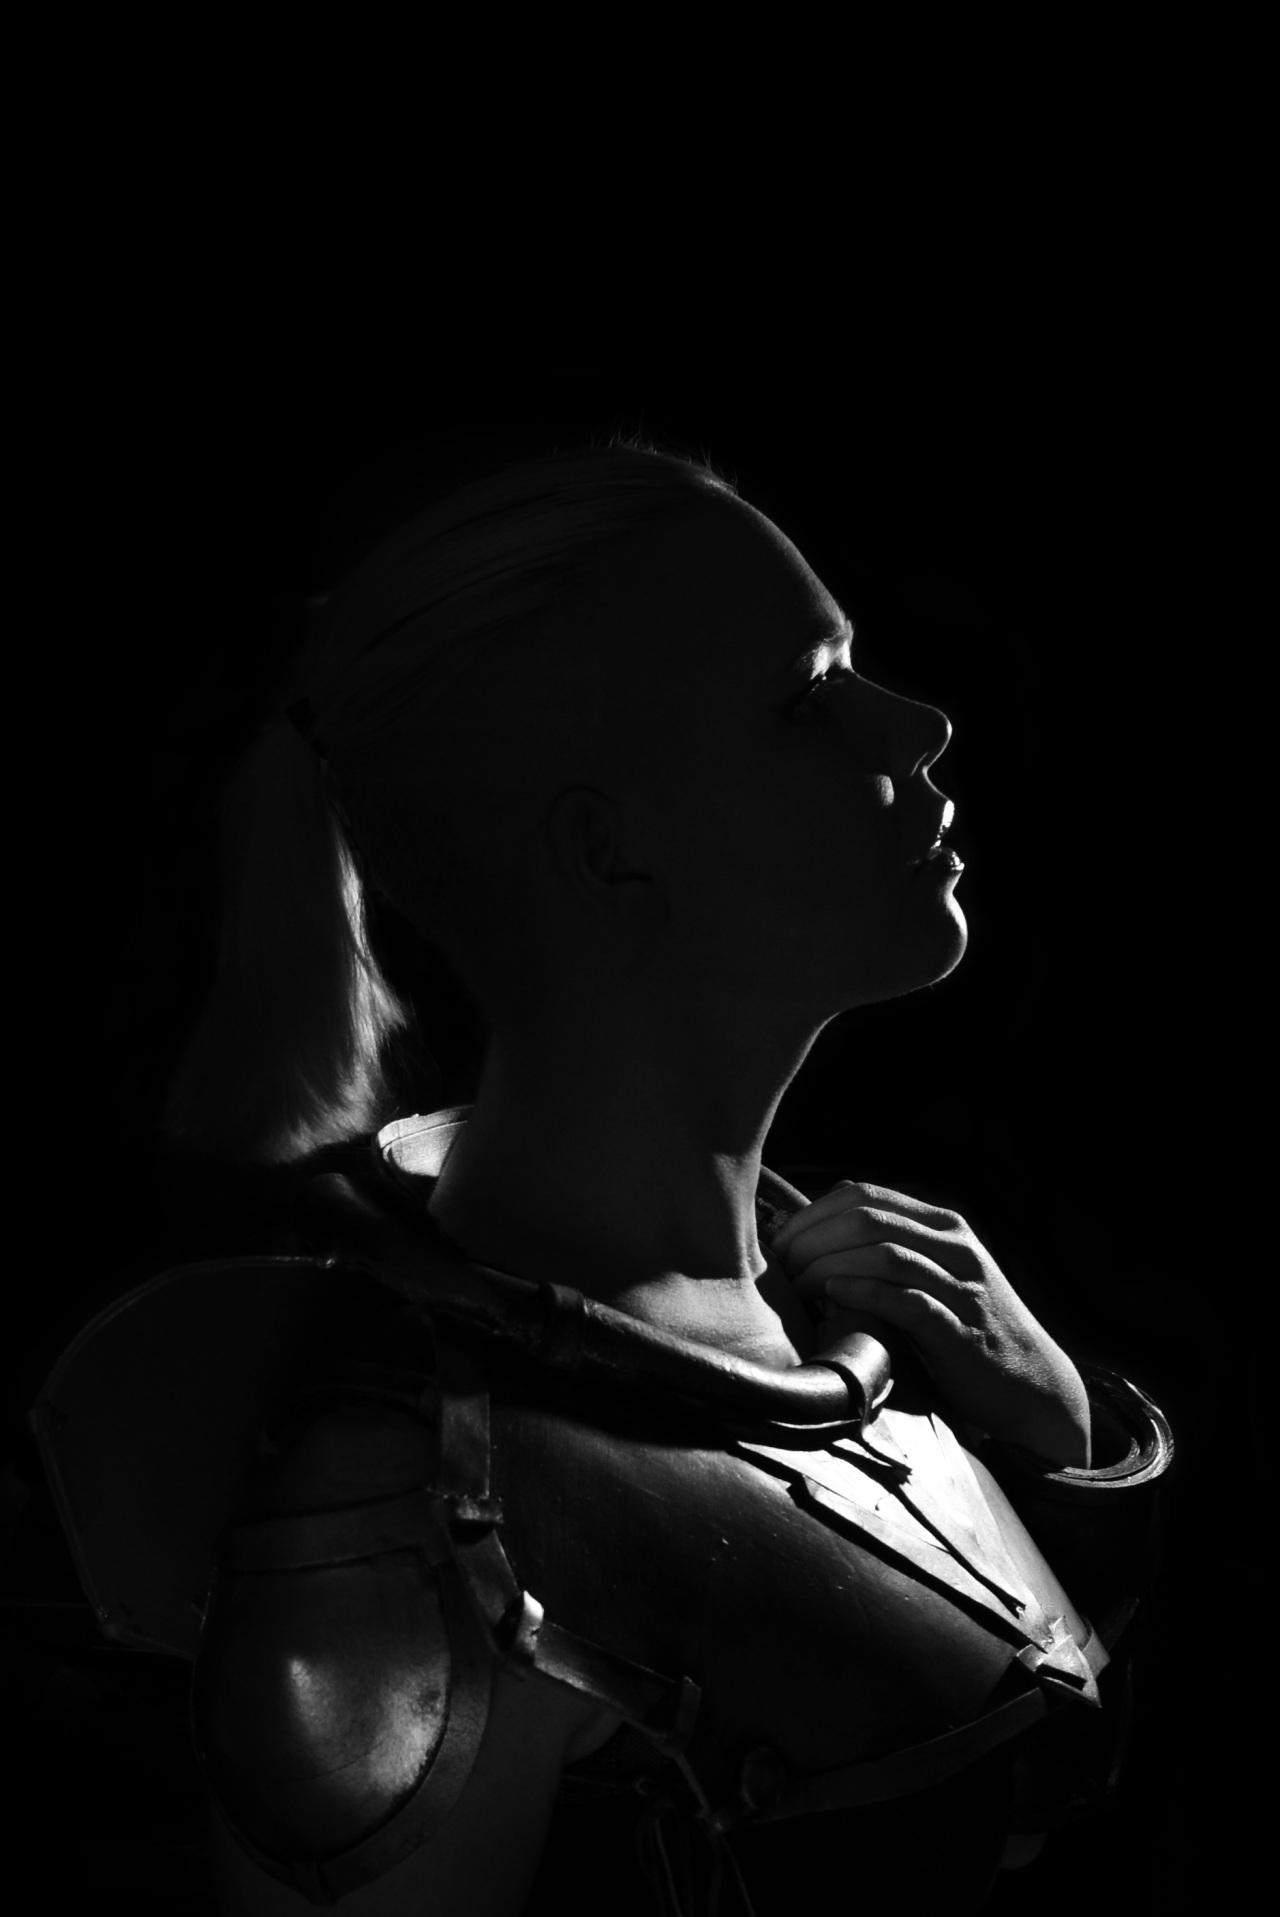 Photo by J.R. Blackwell, Armor, Warrior Woman, Philadelphia Photographer,